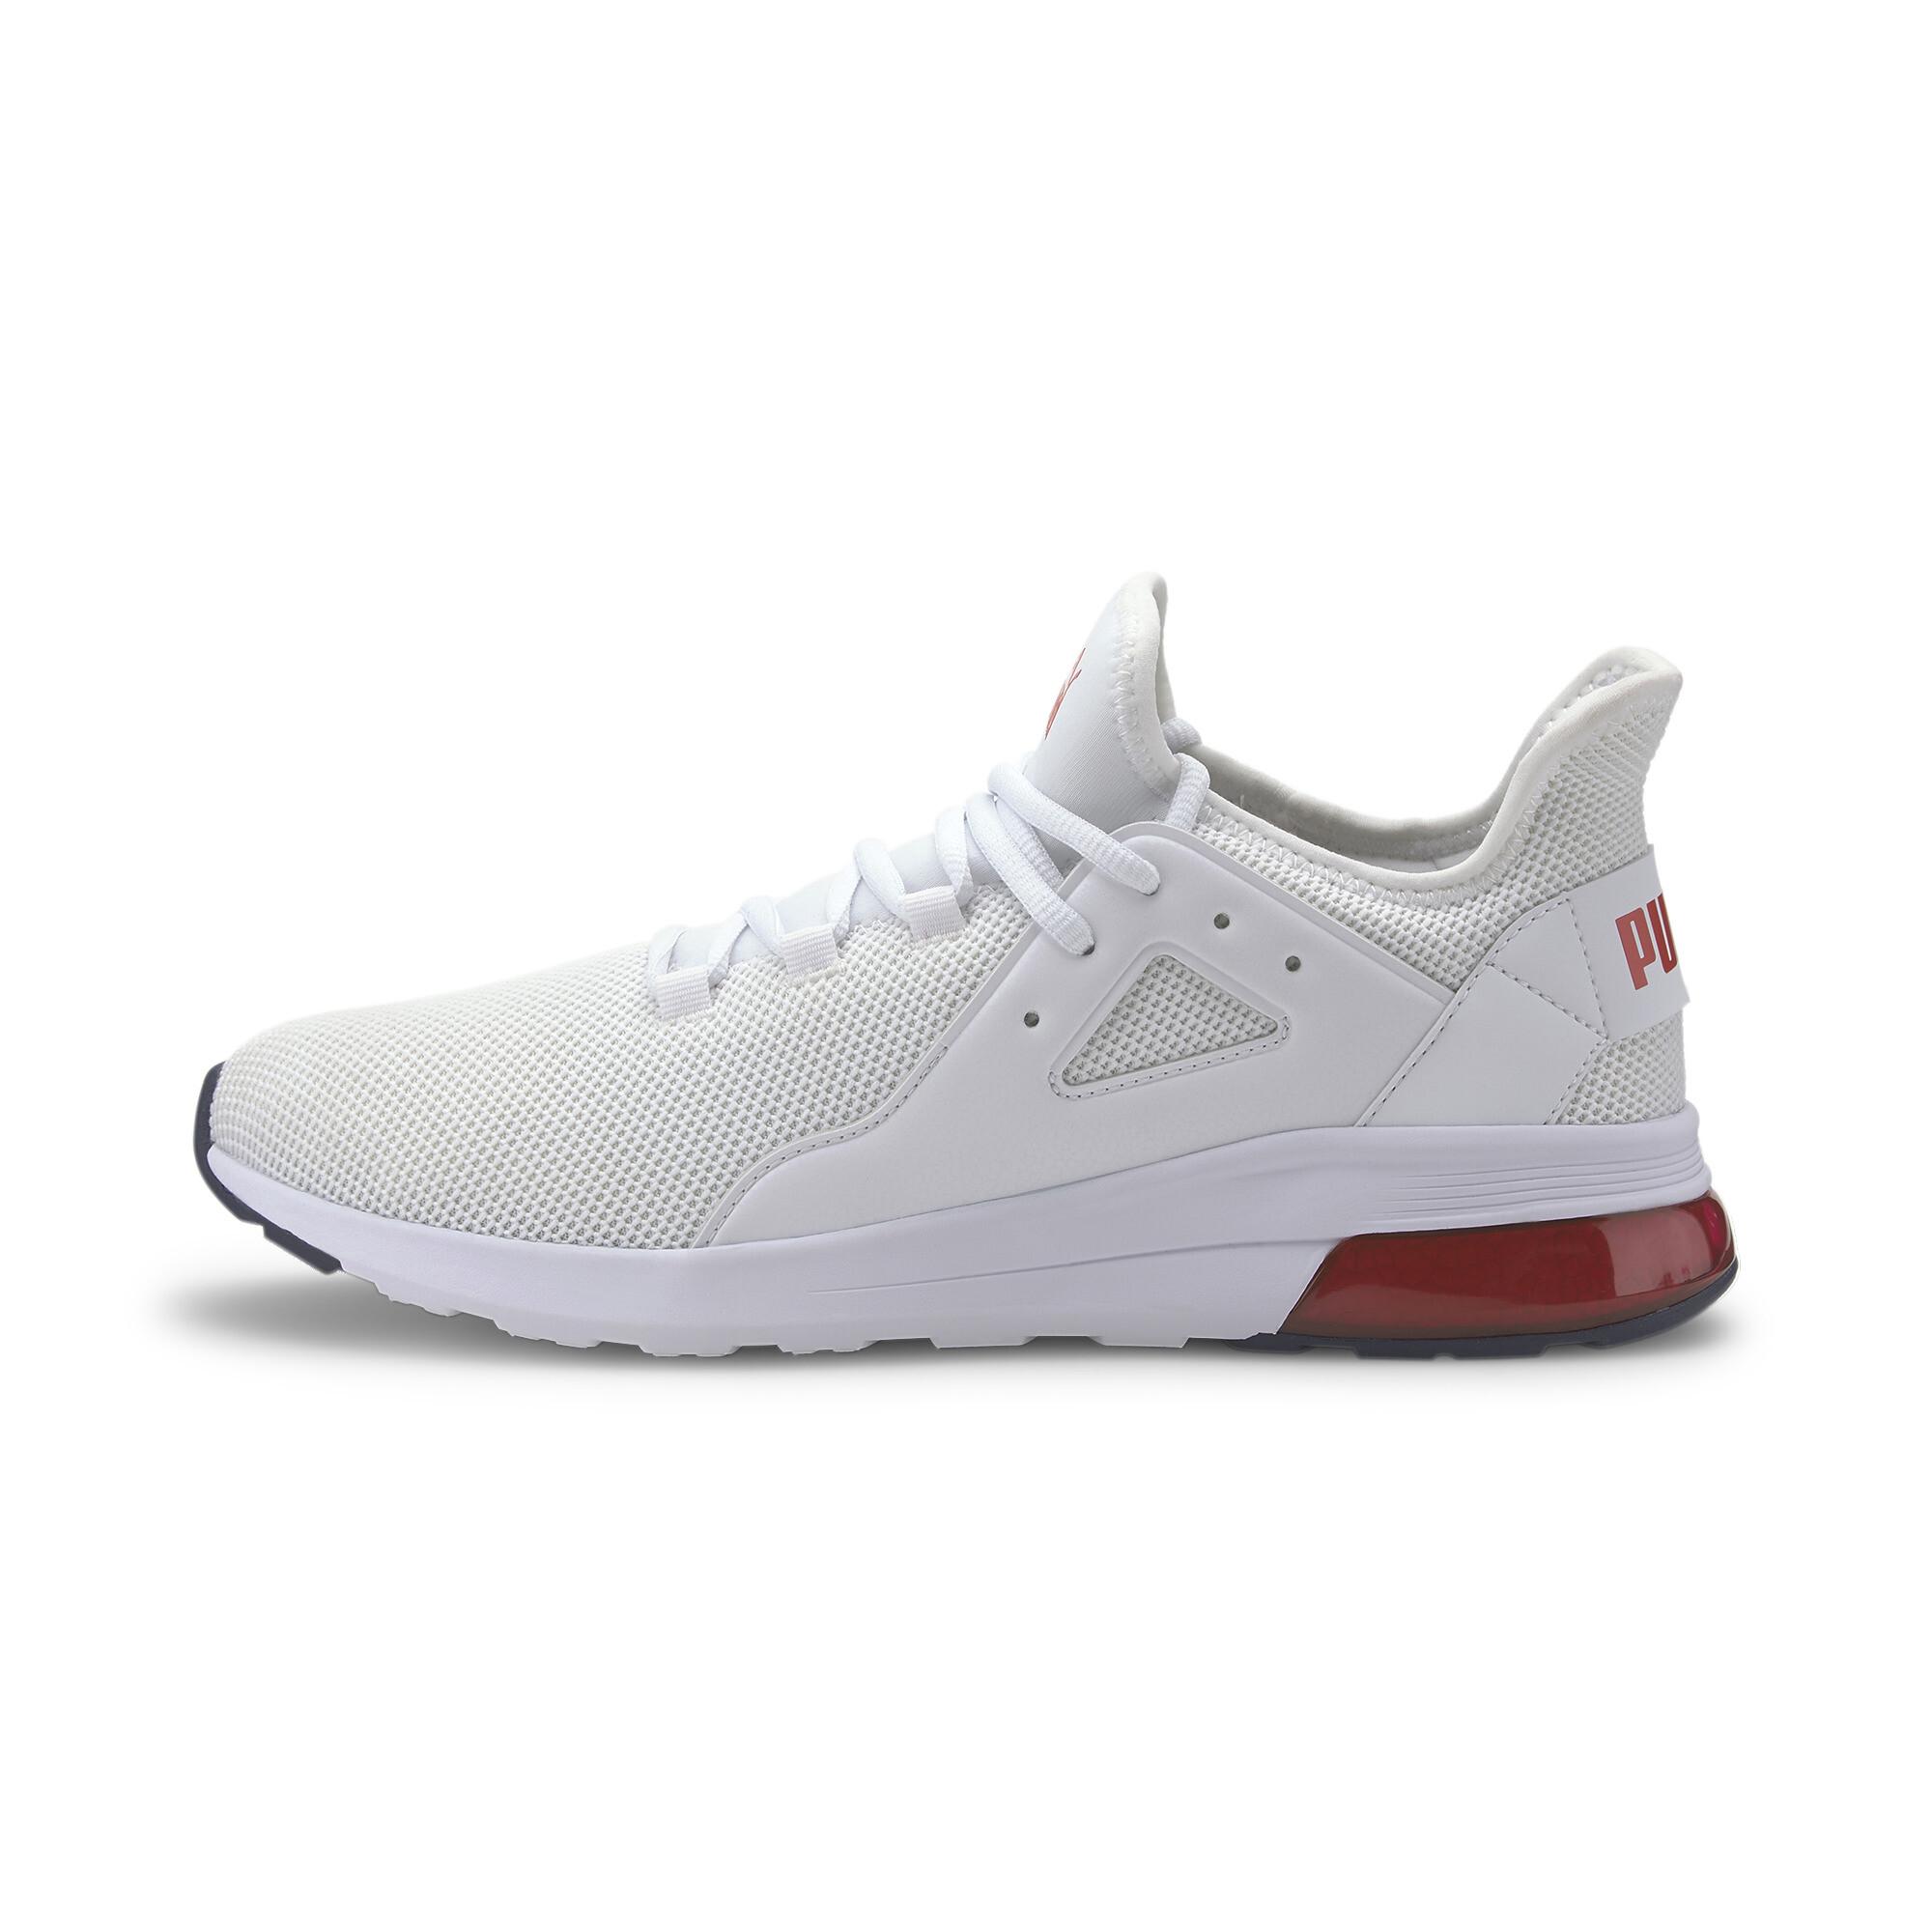 PUMA-Men-039-s-Electron-Street-Sneakers thumbnail 14